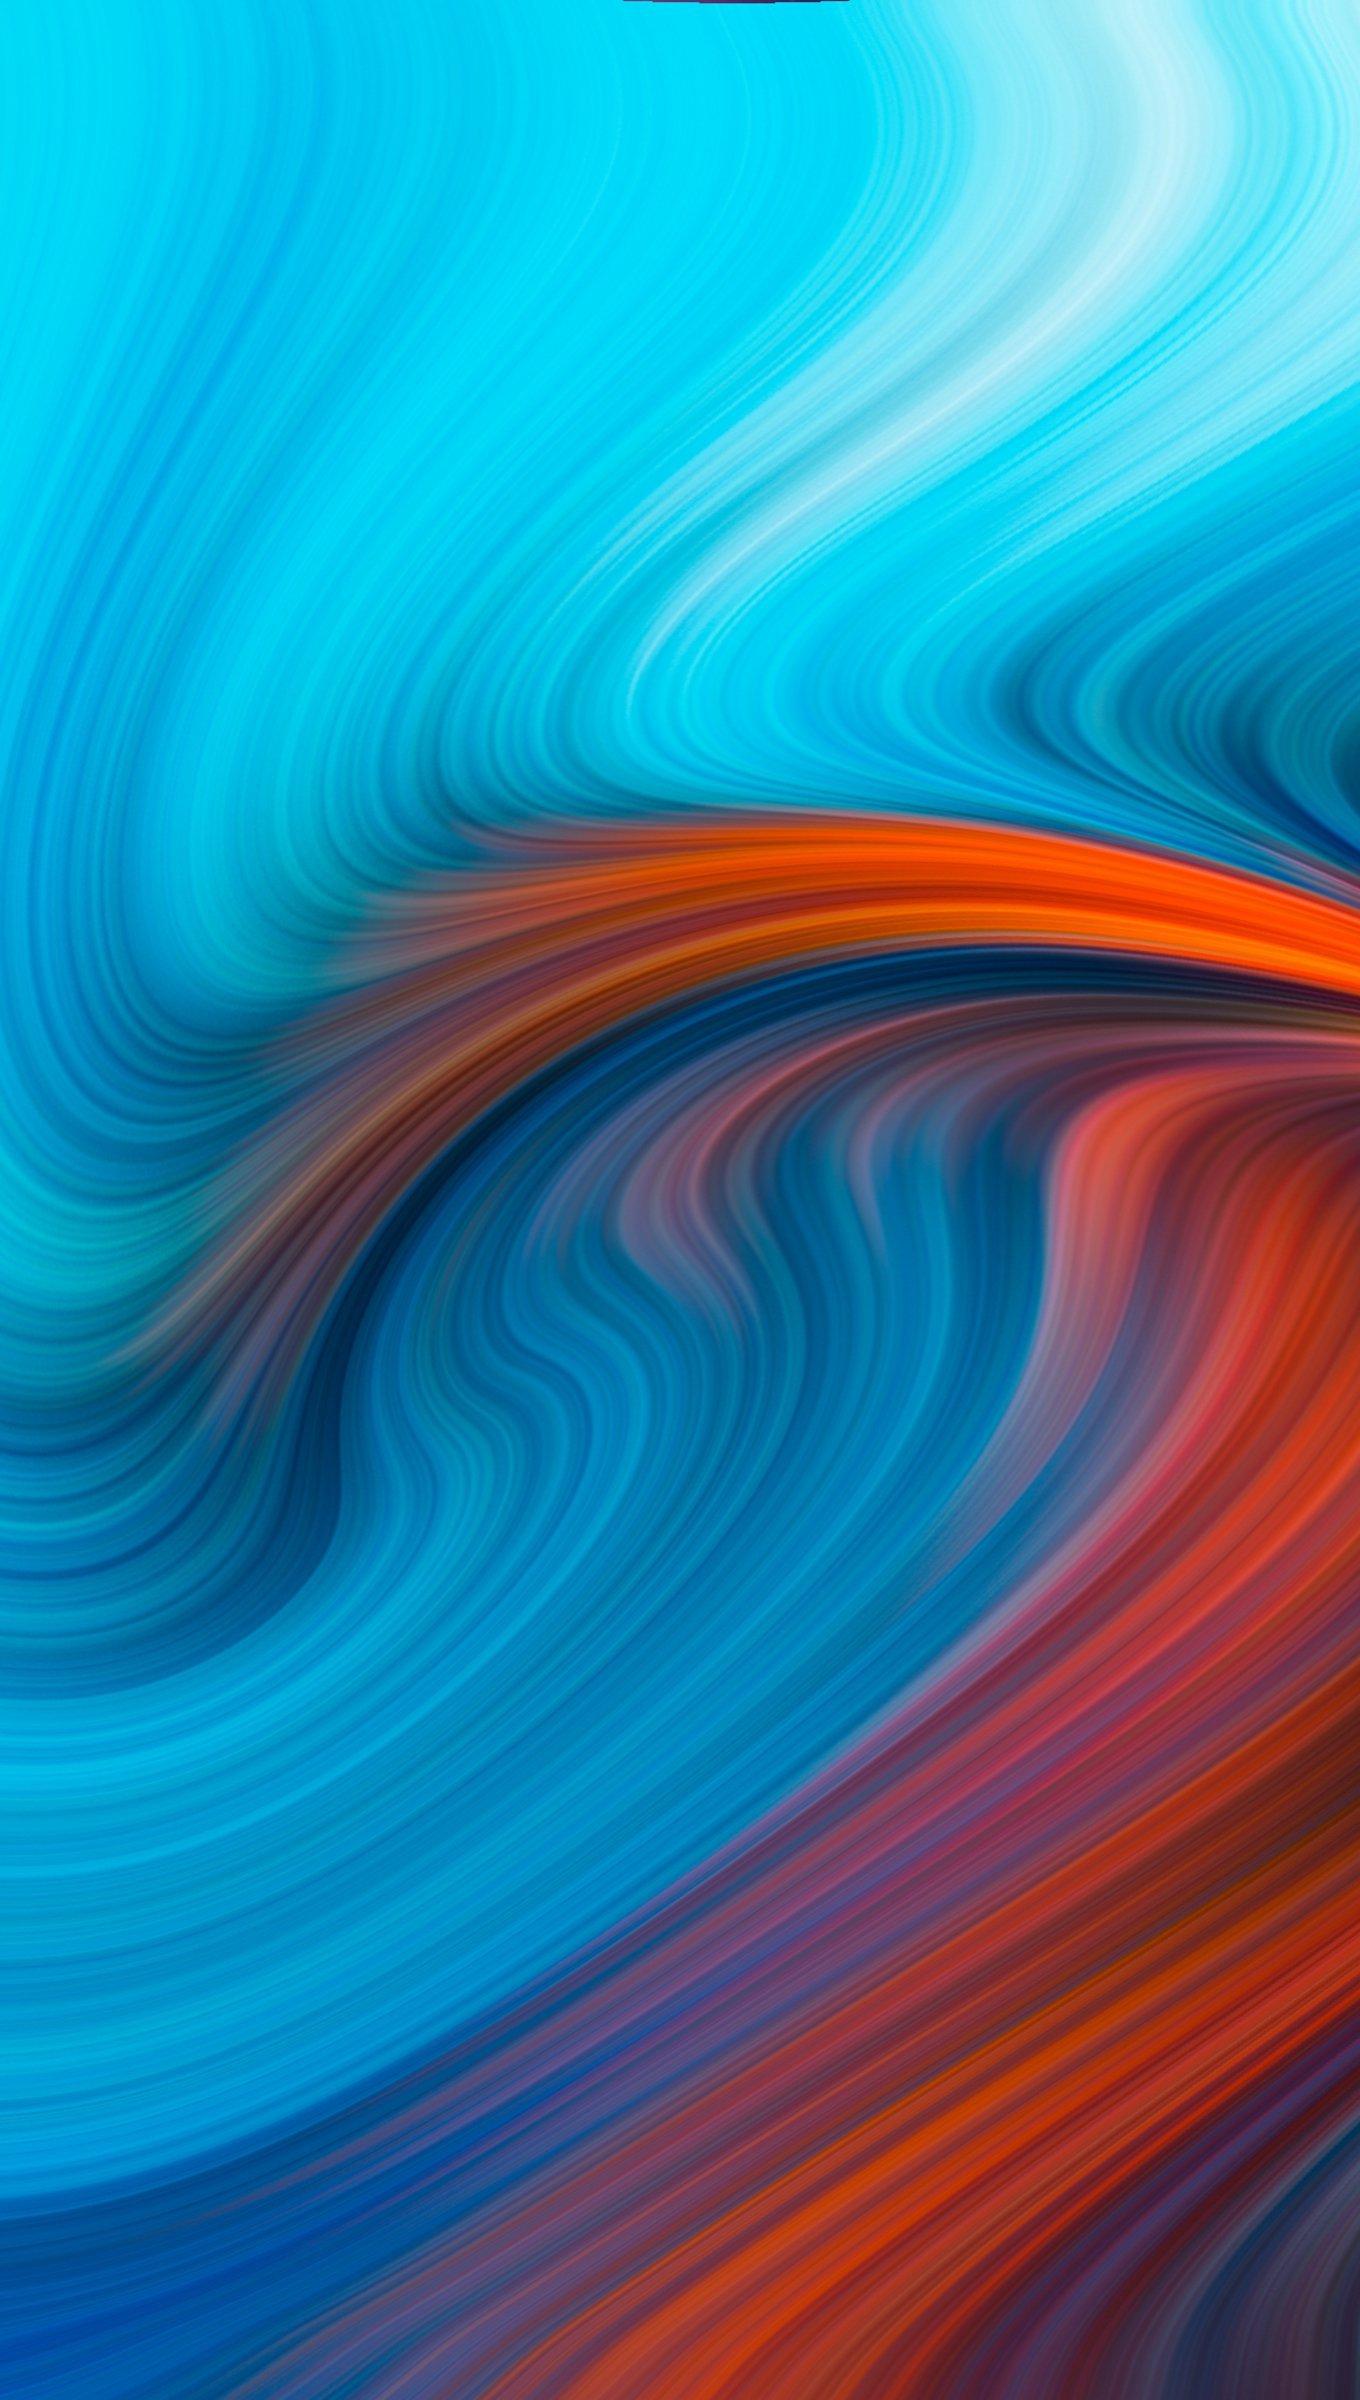 Fondos de pantalla Hoyo azul y naranja Vertical